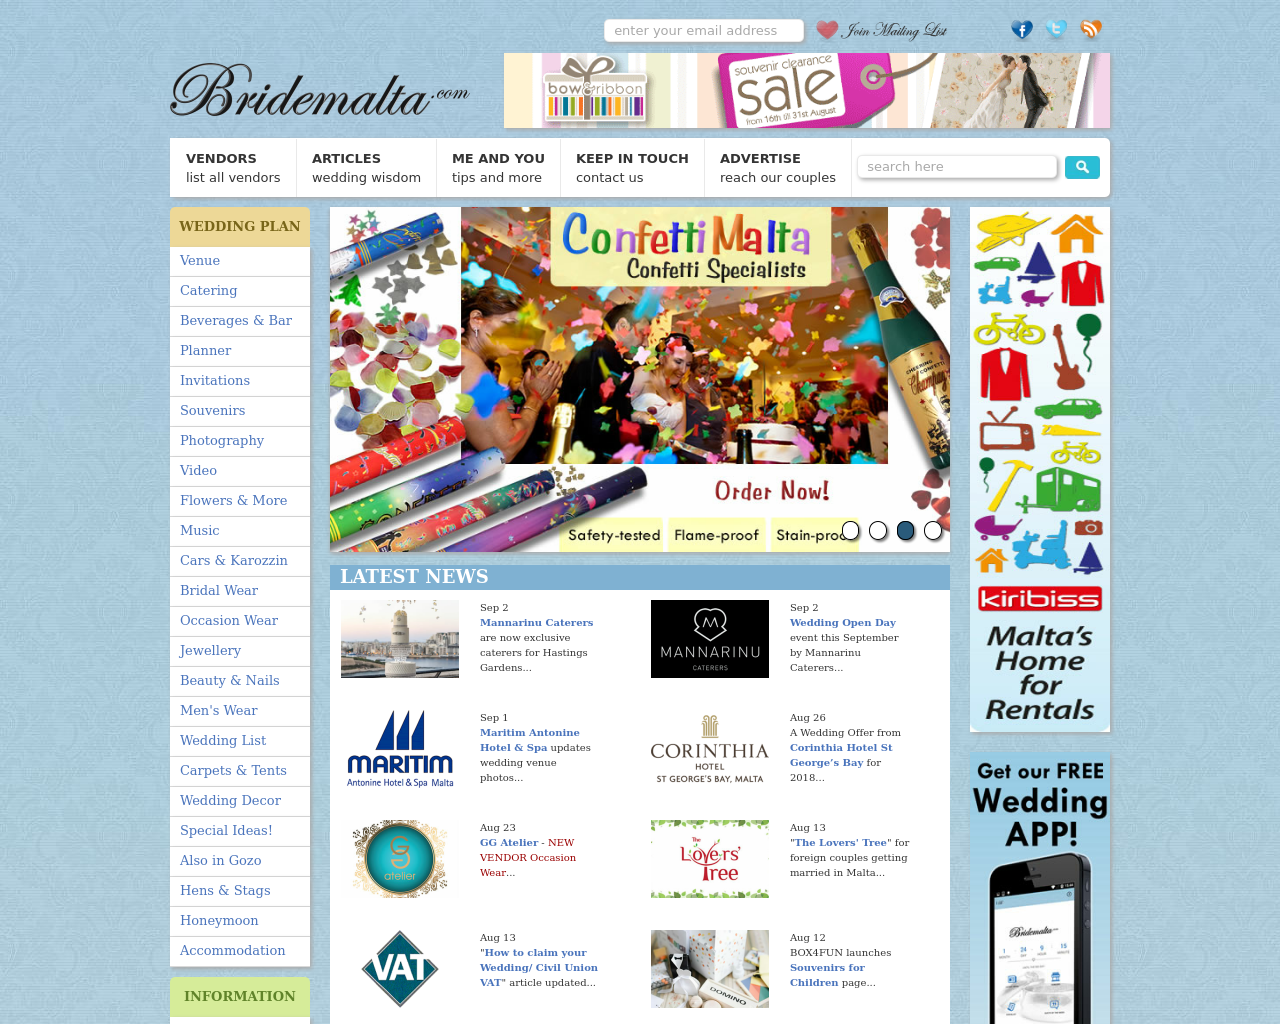 Bridemalta.com-Advertising-Reviews-Pricing